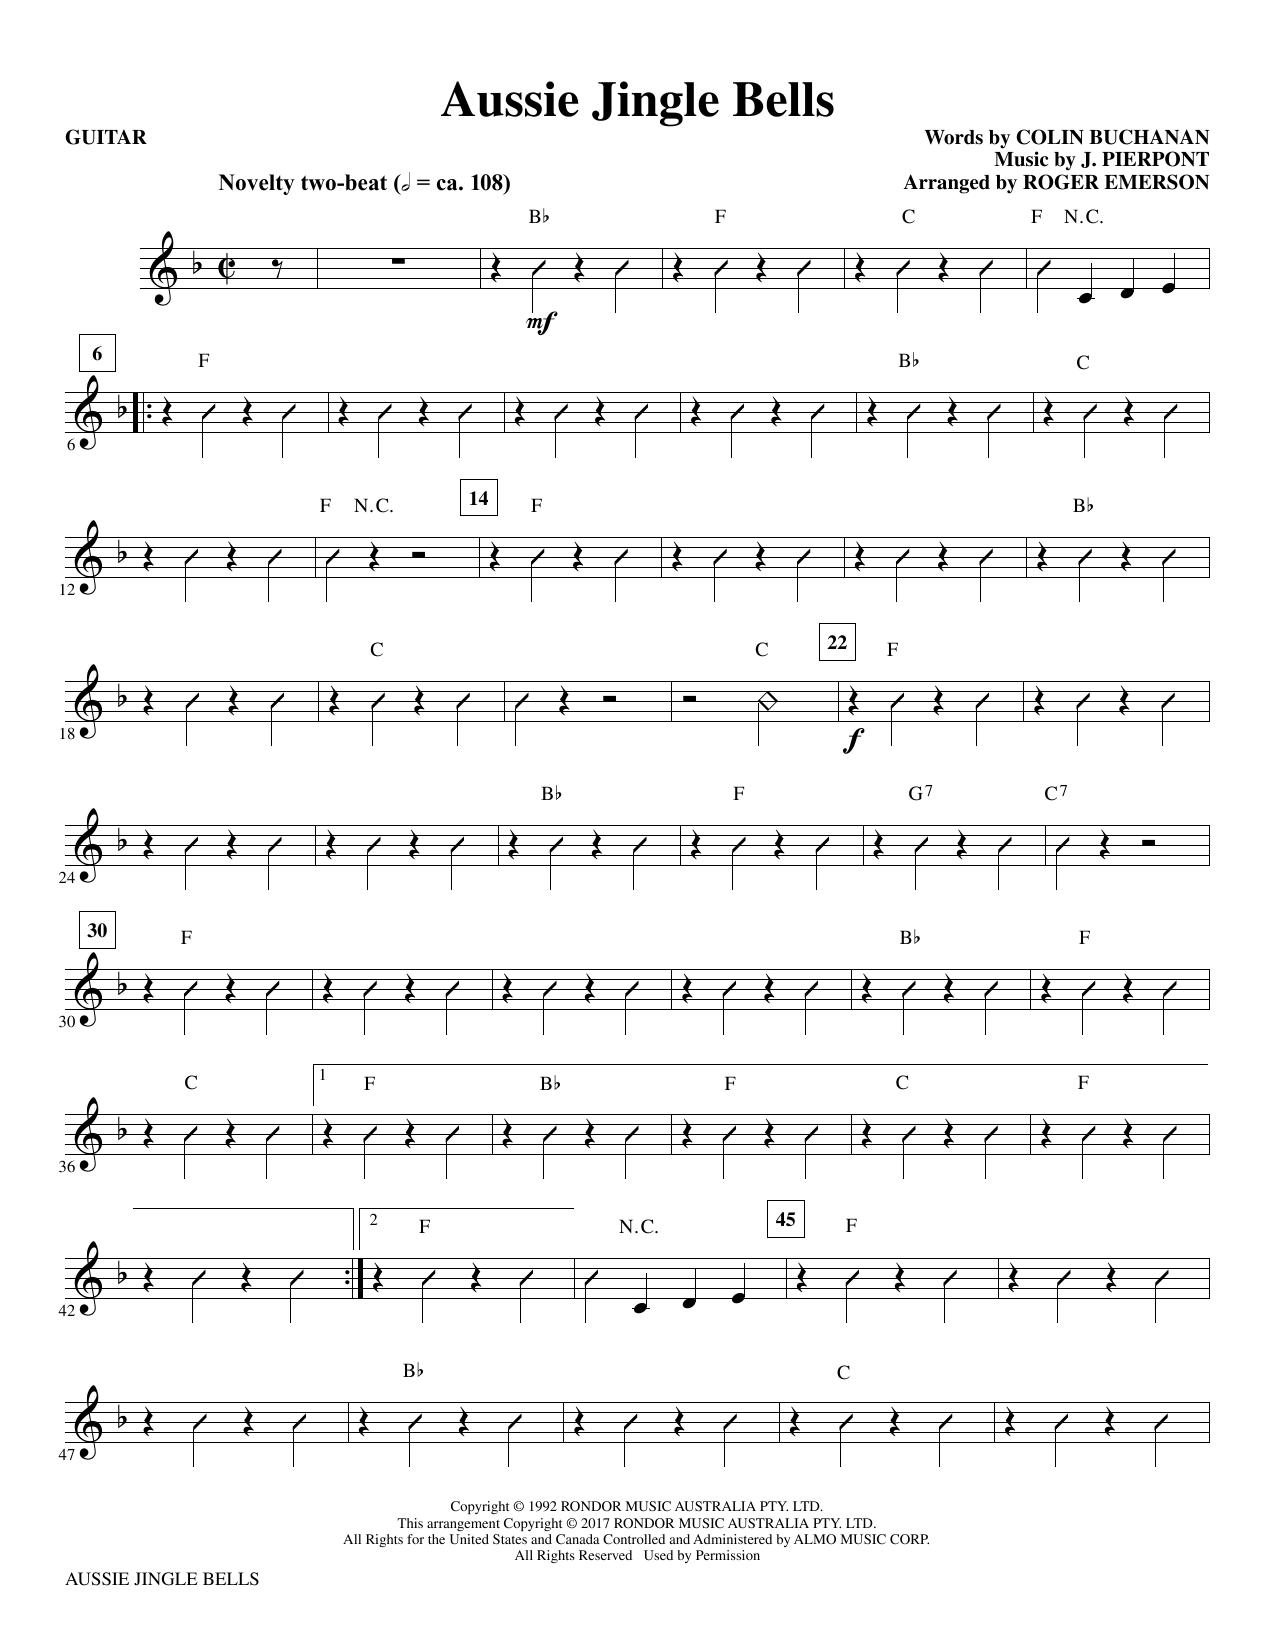 Sheet Music Digital Files To Print Licensed J Pierpont Digital